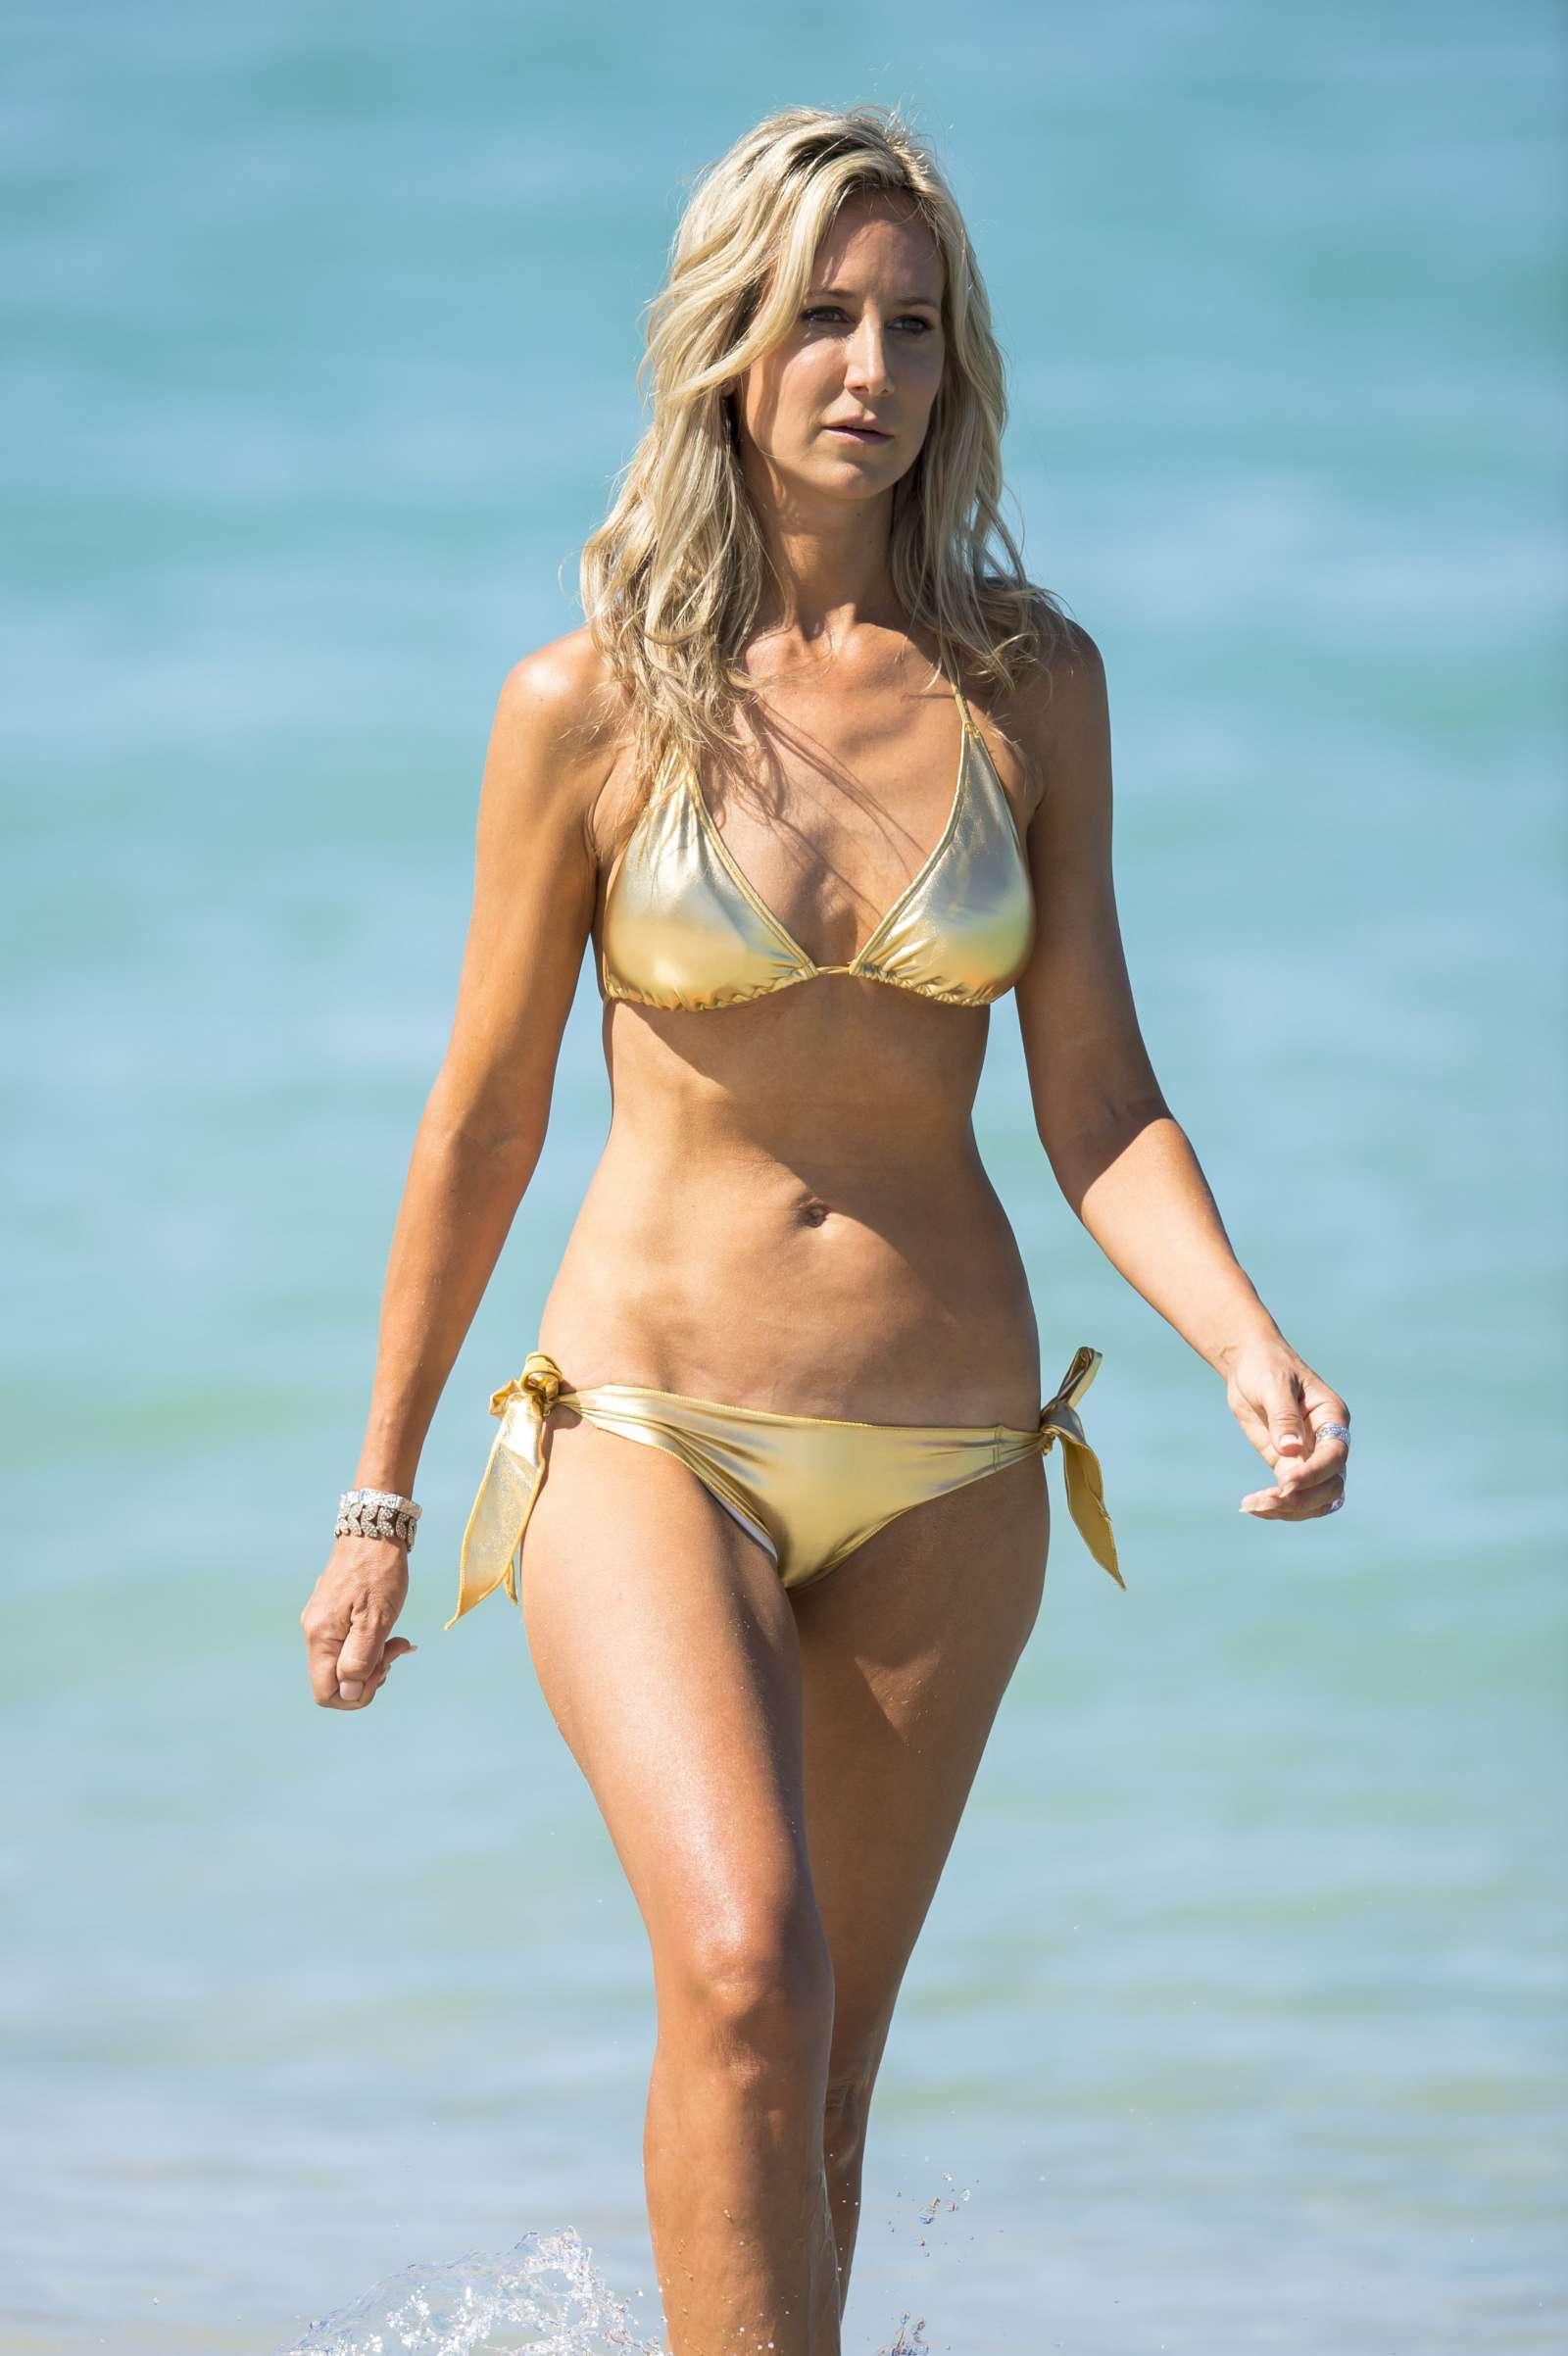 Lady Victoria Hervey in Bikini at the beach in Miami